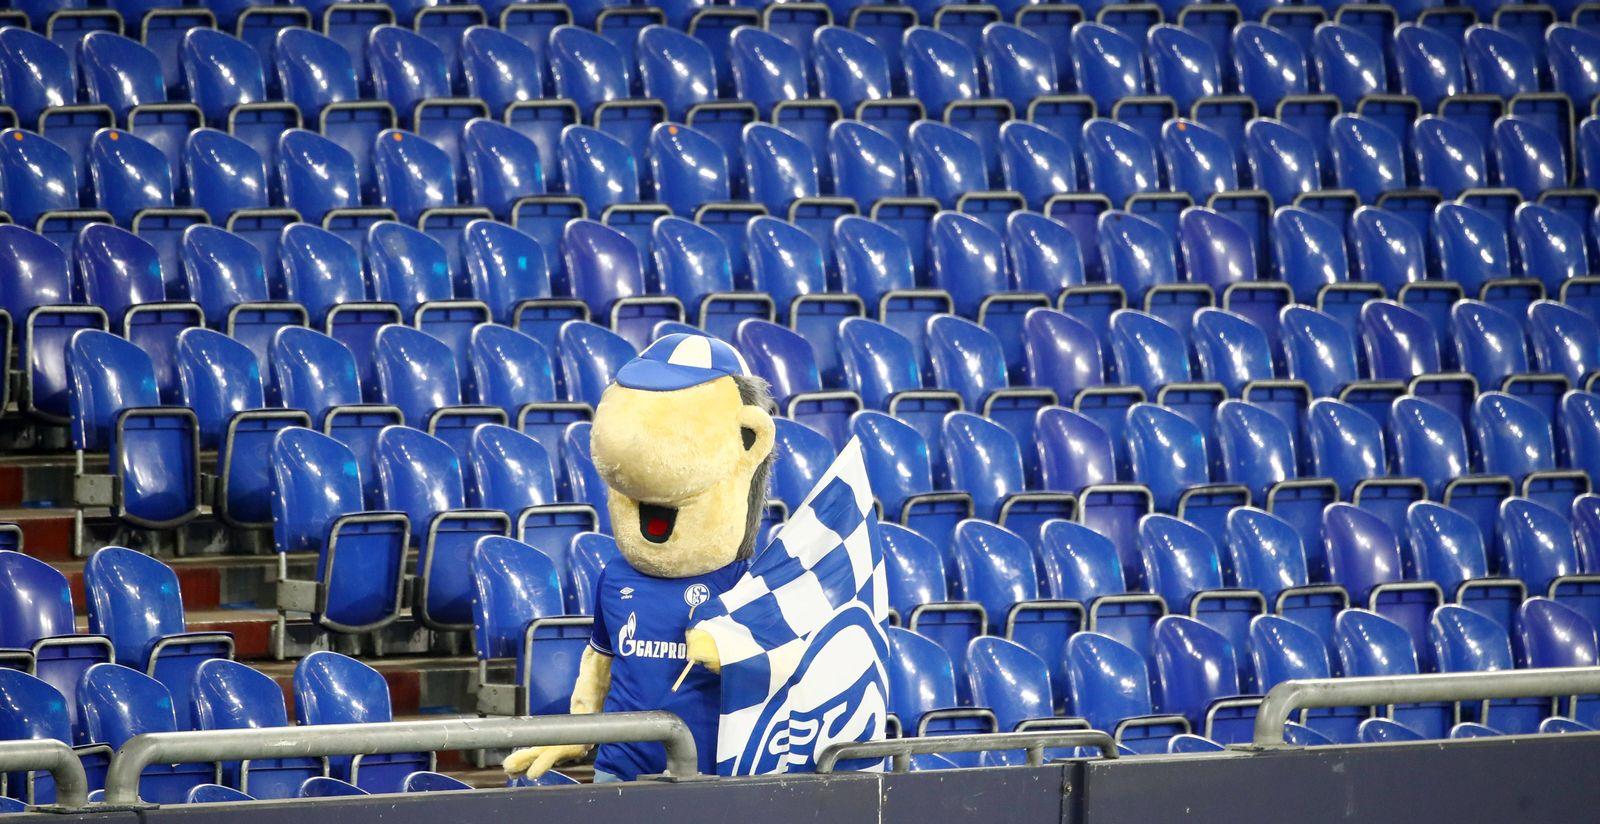 Schalke 04 - RB Leipzig / 06.02.2021 Gelsenkirchen, 06.02.2021, VELTINS-Arena, Fußball, DFL, Bundesliga , FC Schalke 04